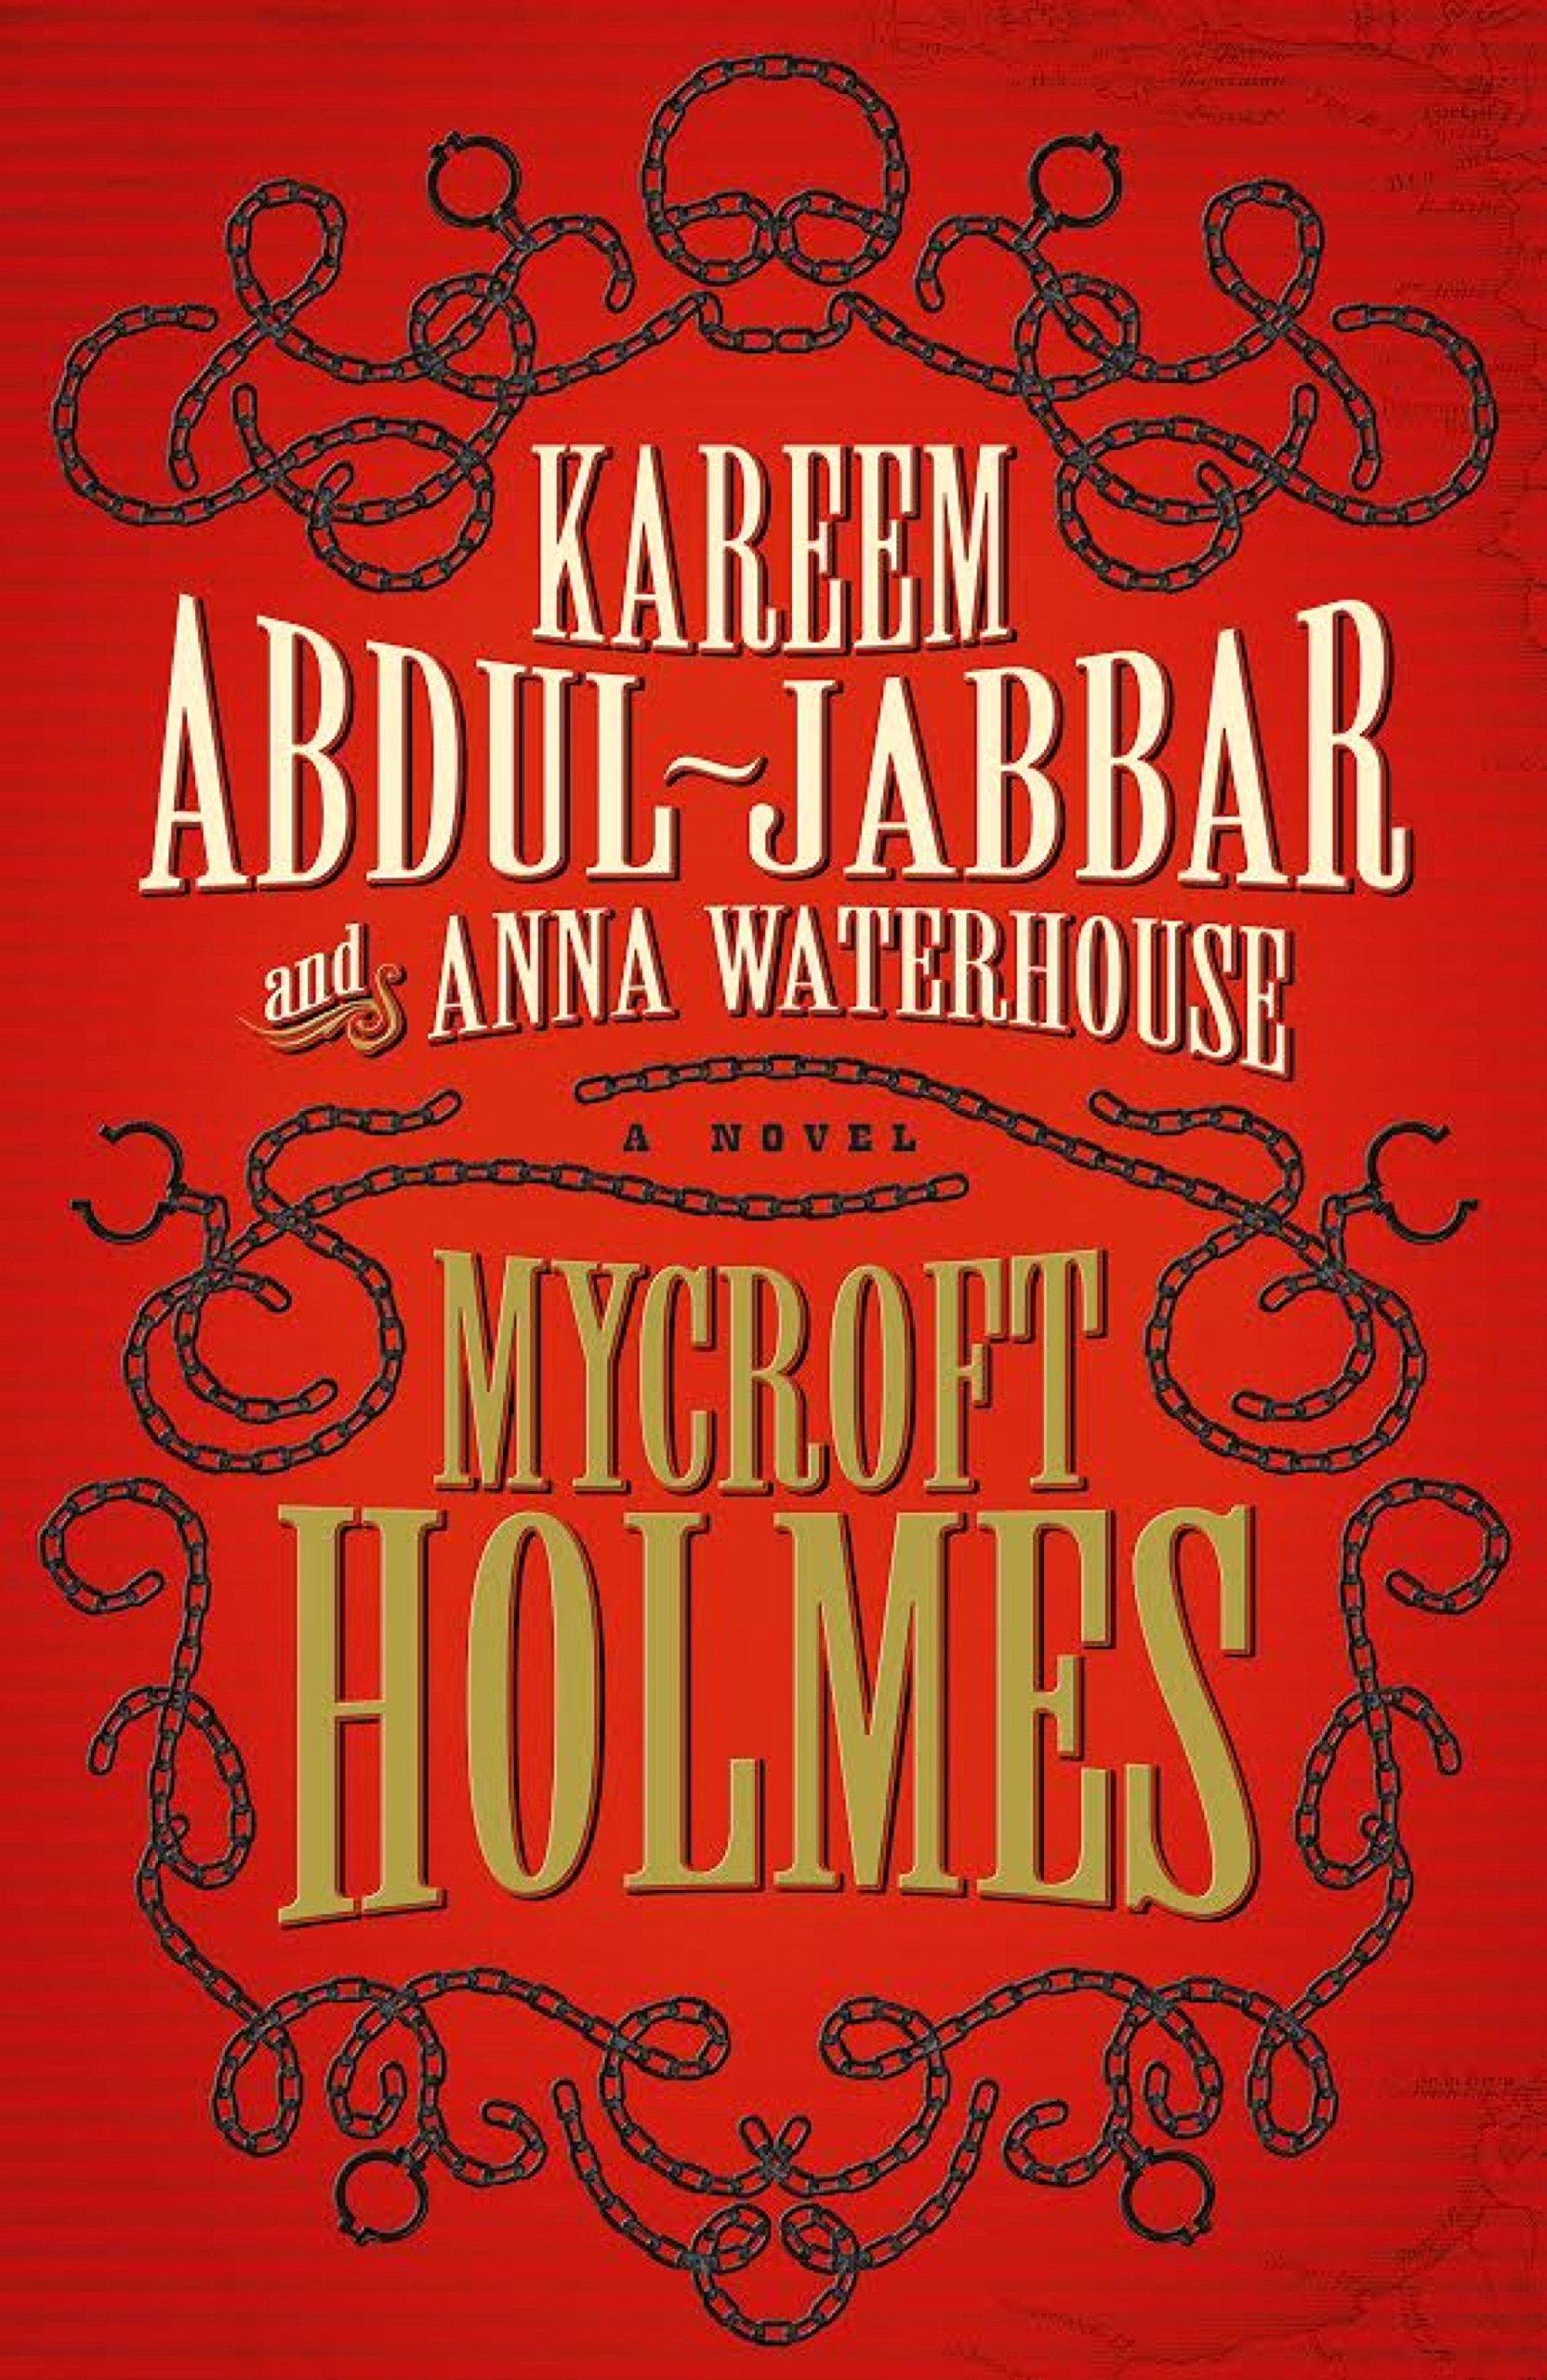 Image result for mycroft holmes by kareem abdul-jabbar